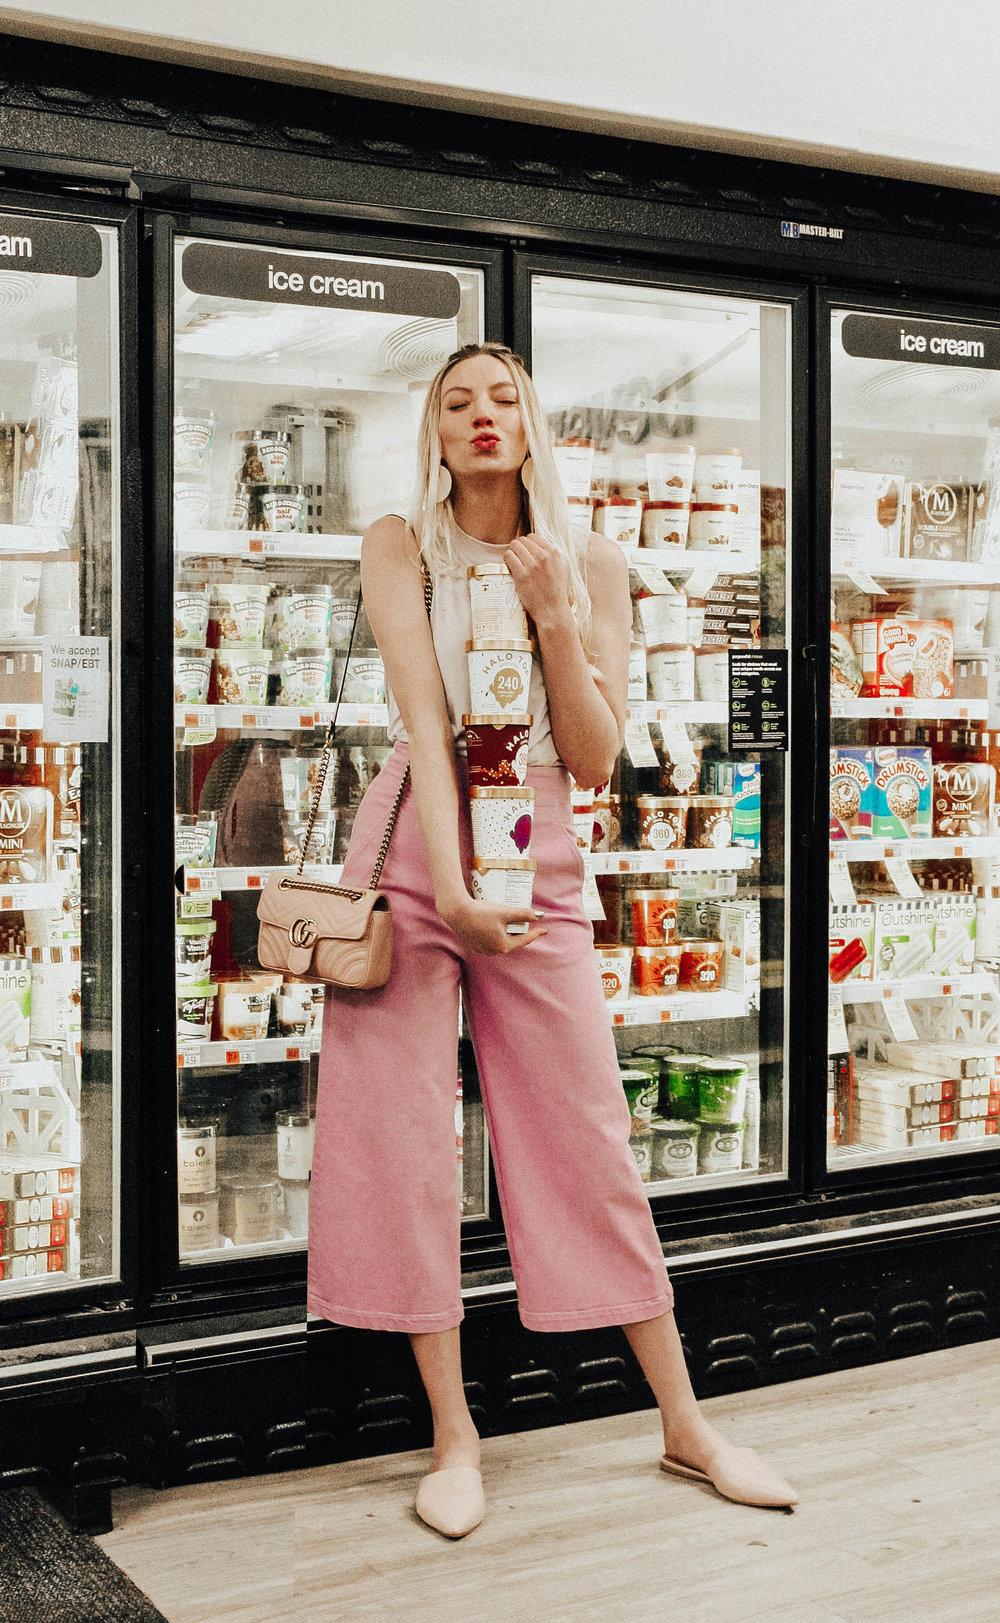 Blogger & Ice Cream | @maevestier